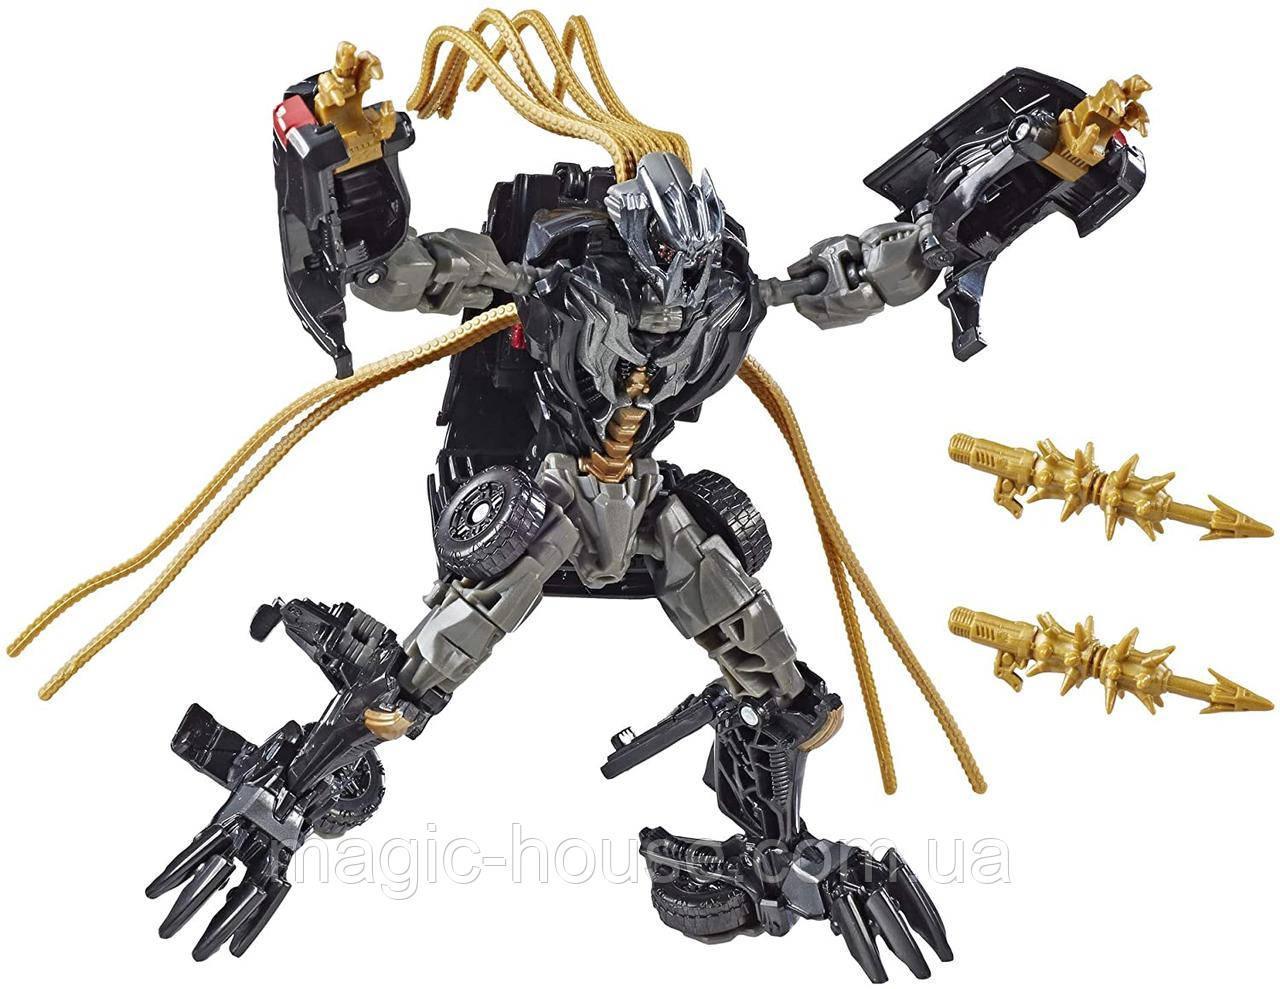 Transformers Кранкейс Dark of The Moon Crankcase Оригінал від Hasbrо